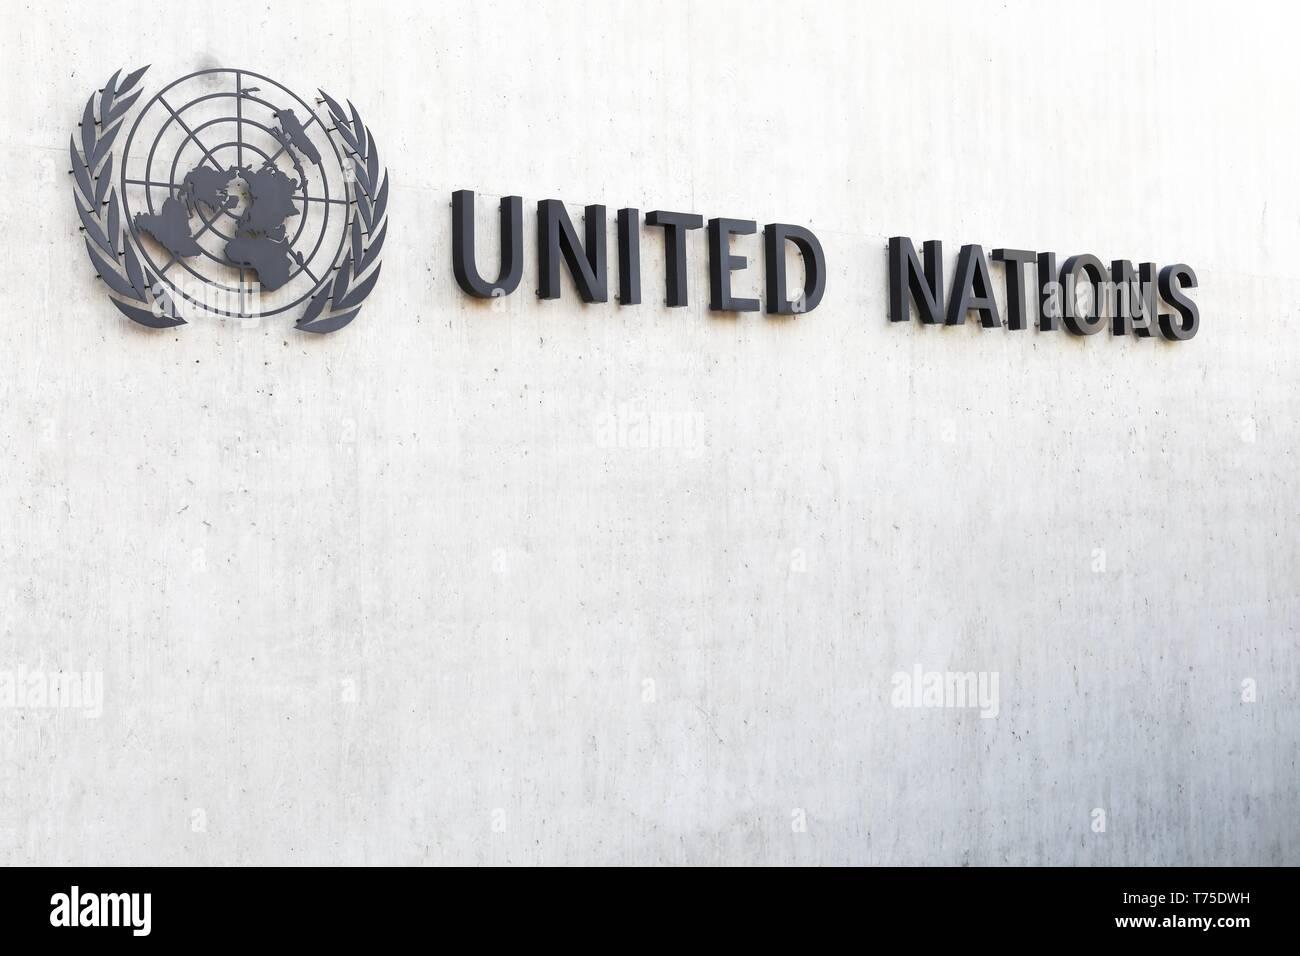 Geneva, Switzerland - October 1, 2017: United Nations symbol on a wall in Geneva, Switzerland - Stock Image